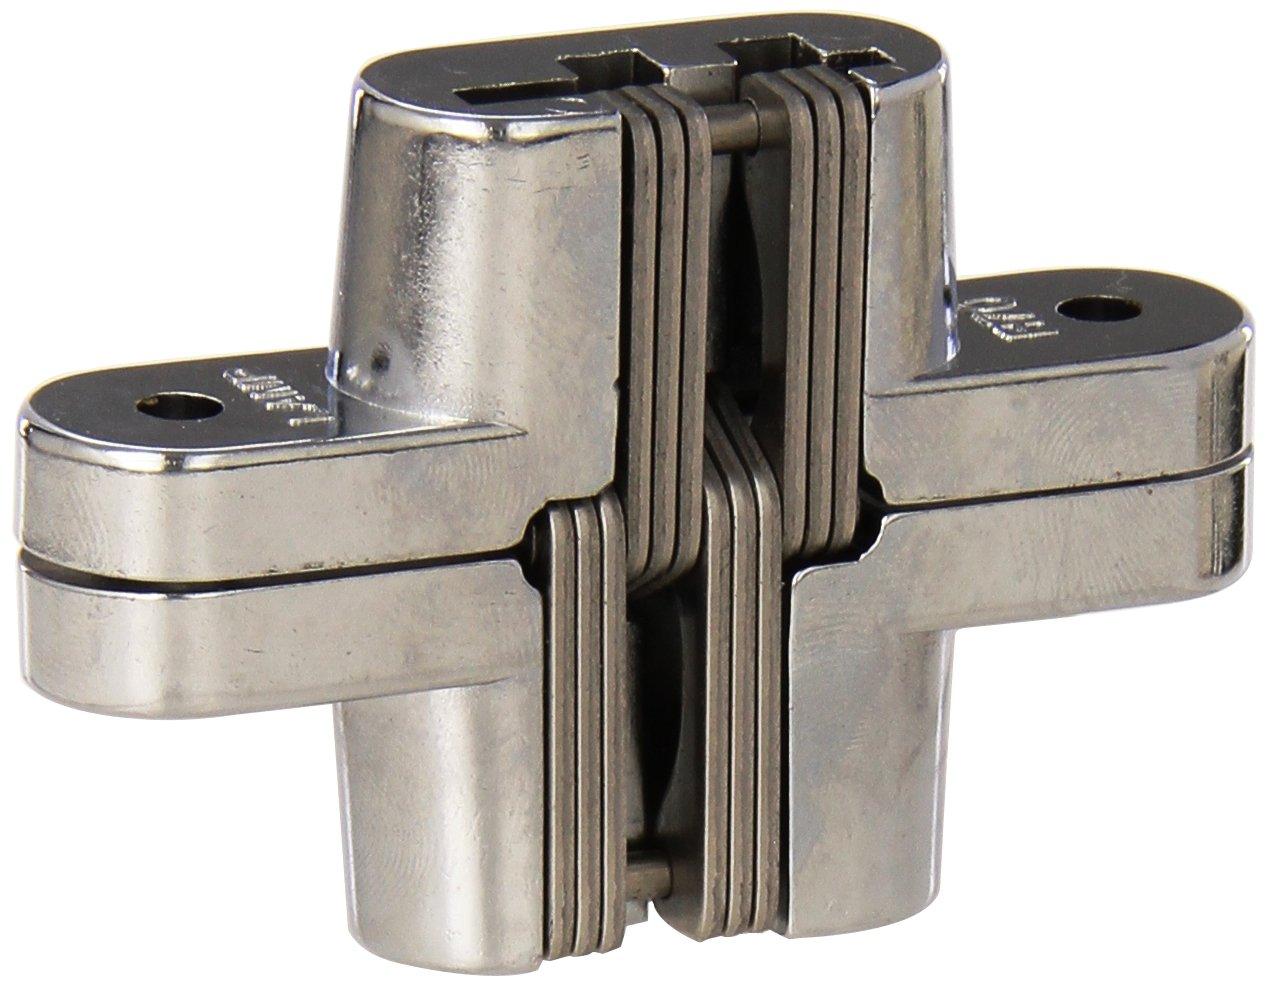 Sugatsune R-70 Zinc Alloy Concealed Hinge, Satin Chrome Finish, 42.6mm Width, 70mm Length, 7mm Thick